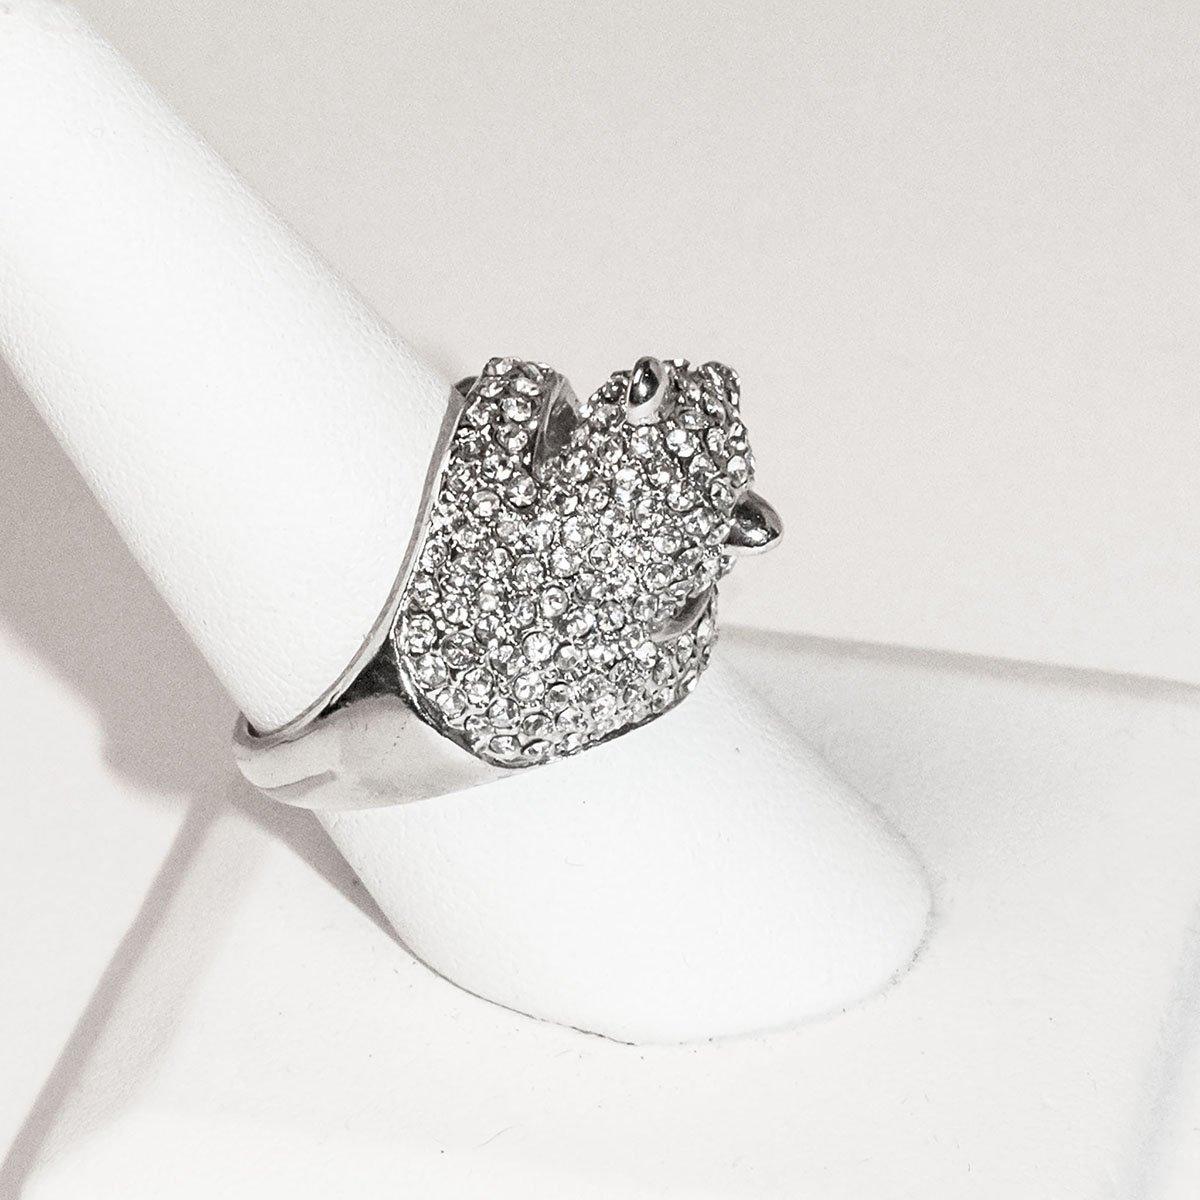 Leopard Rhinestone Ring, Size 9.5